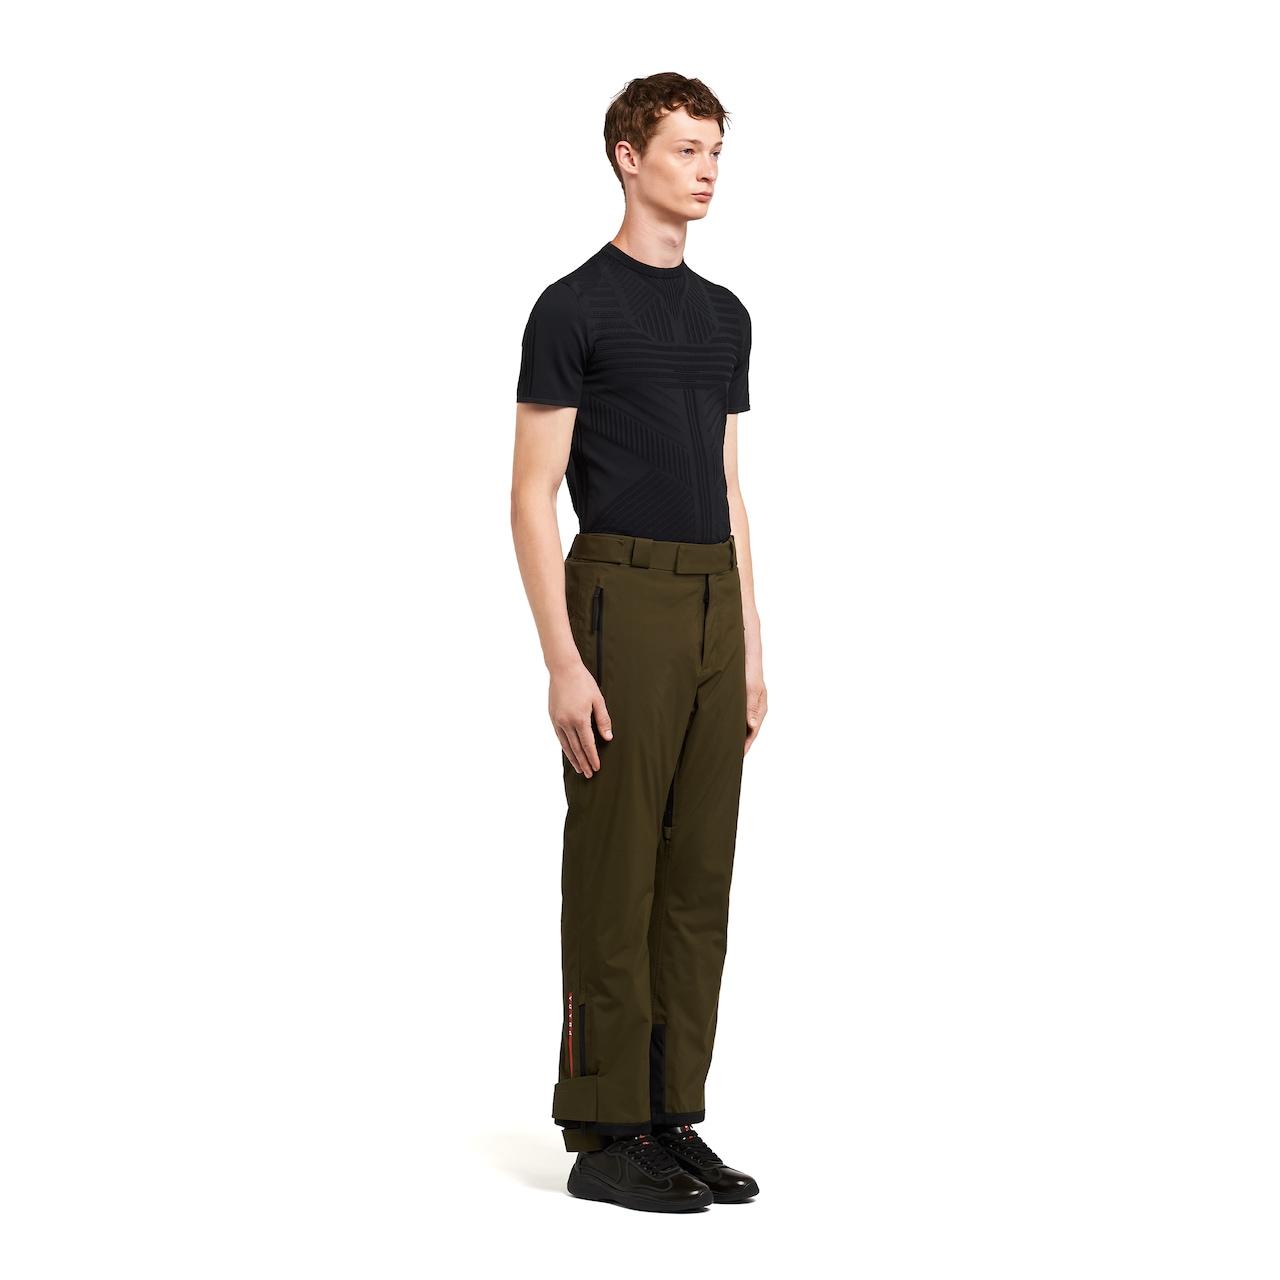 Prada LR-HX018 technical fabric ski trousers 3